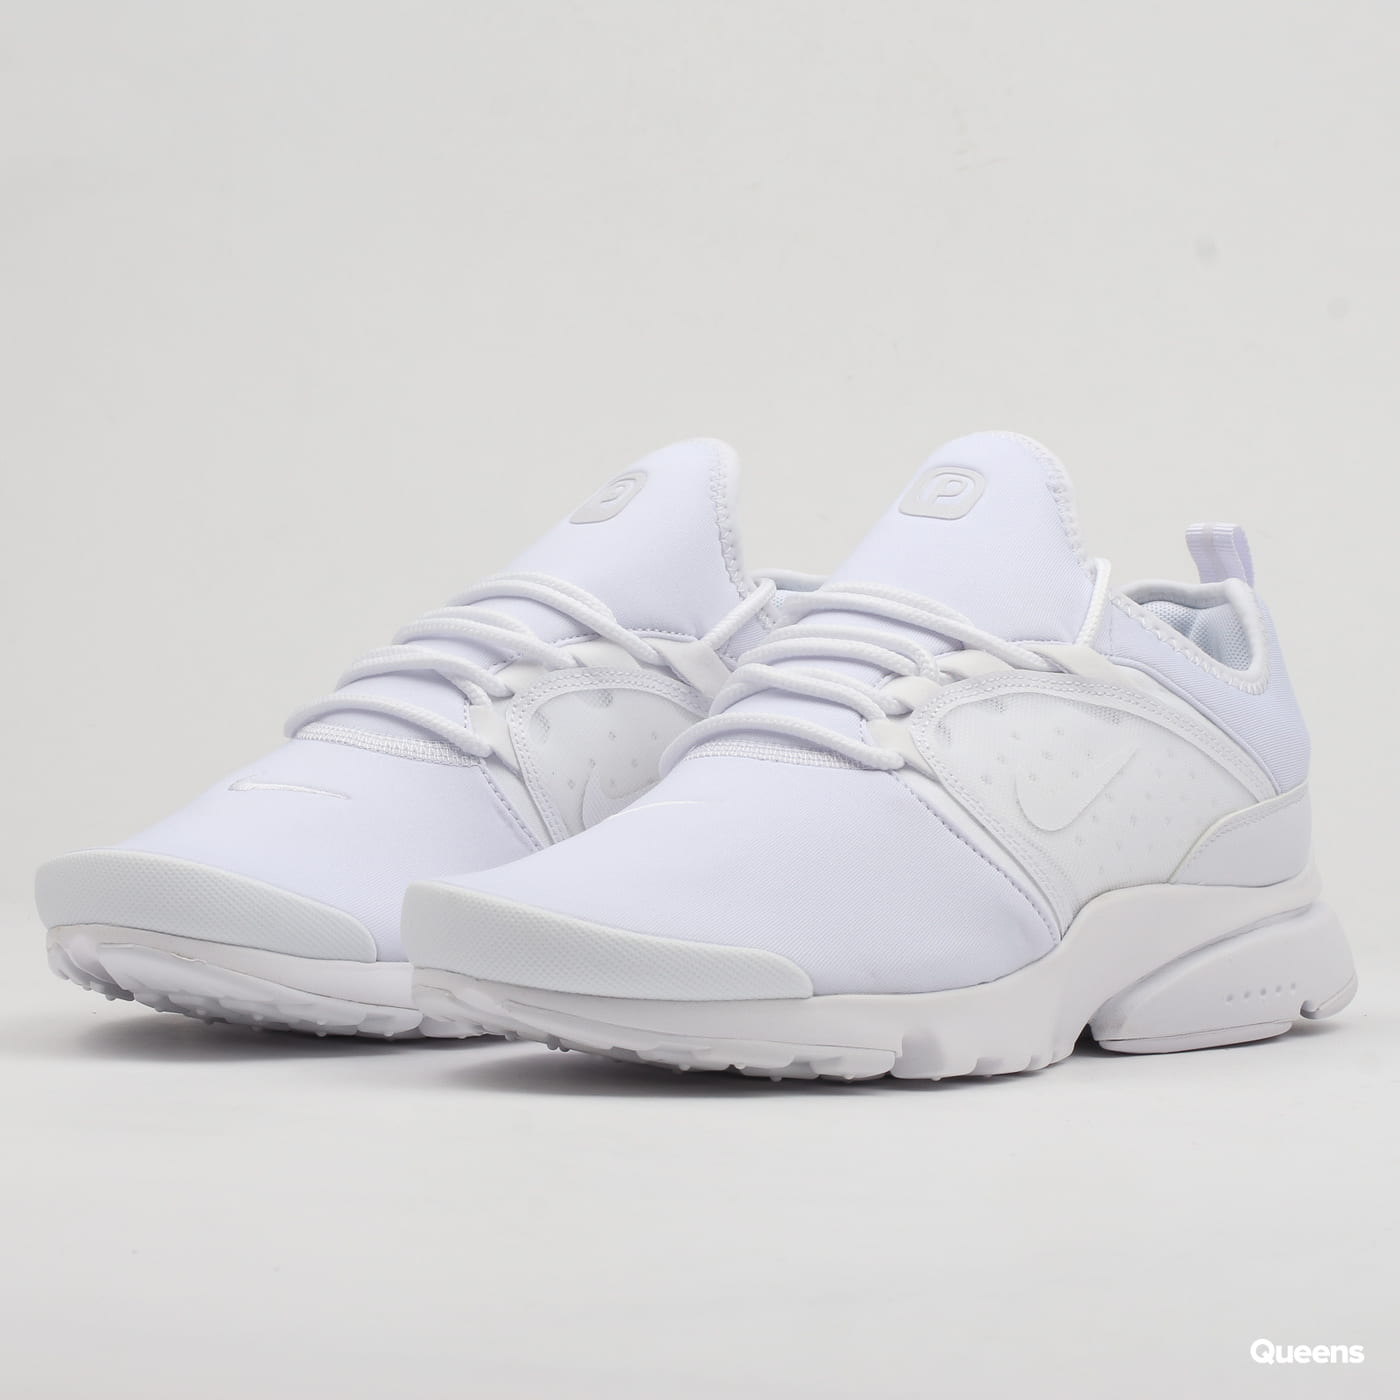 Sneakers Nike Presto Fly World white